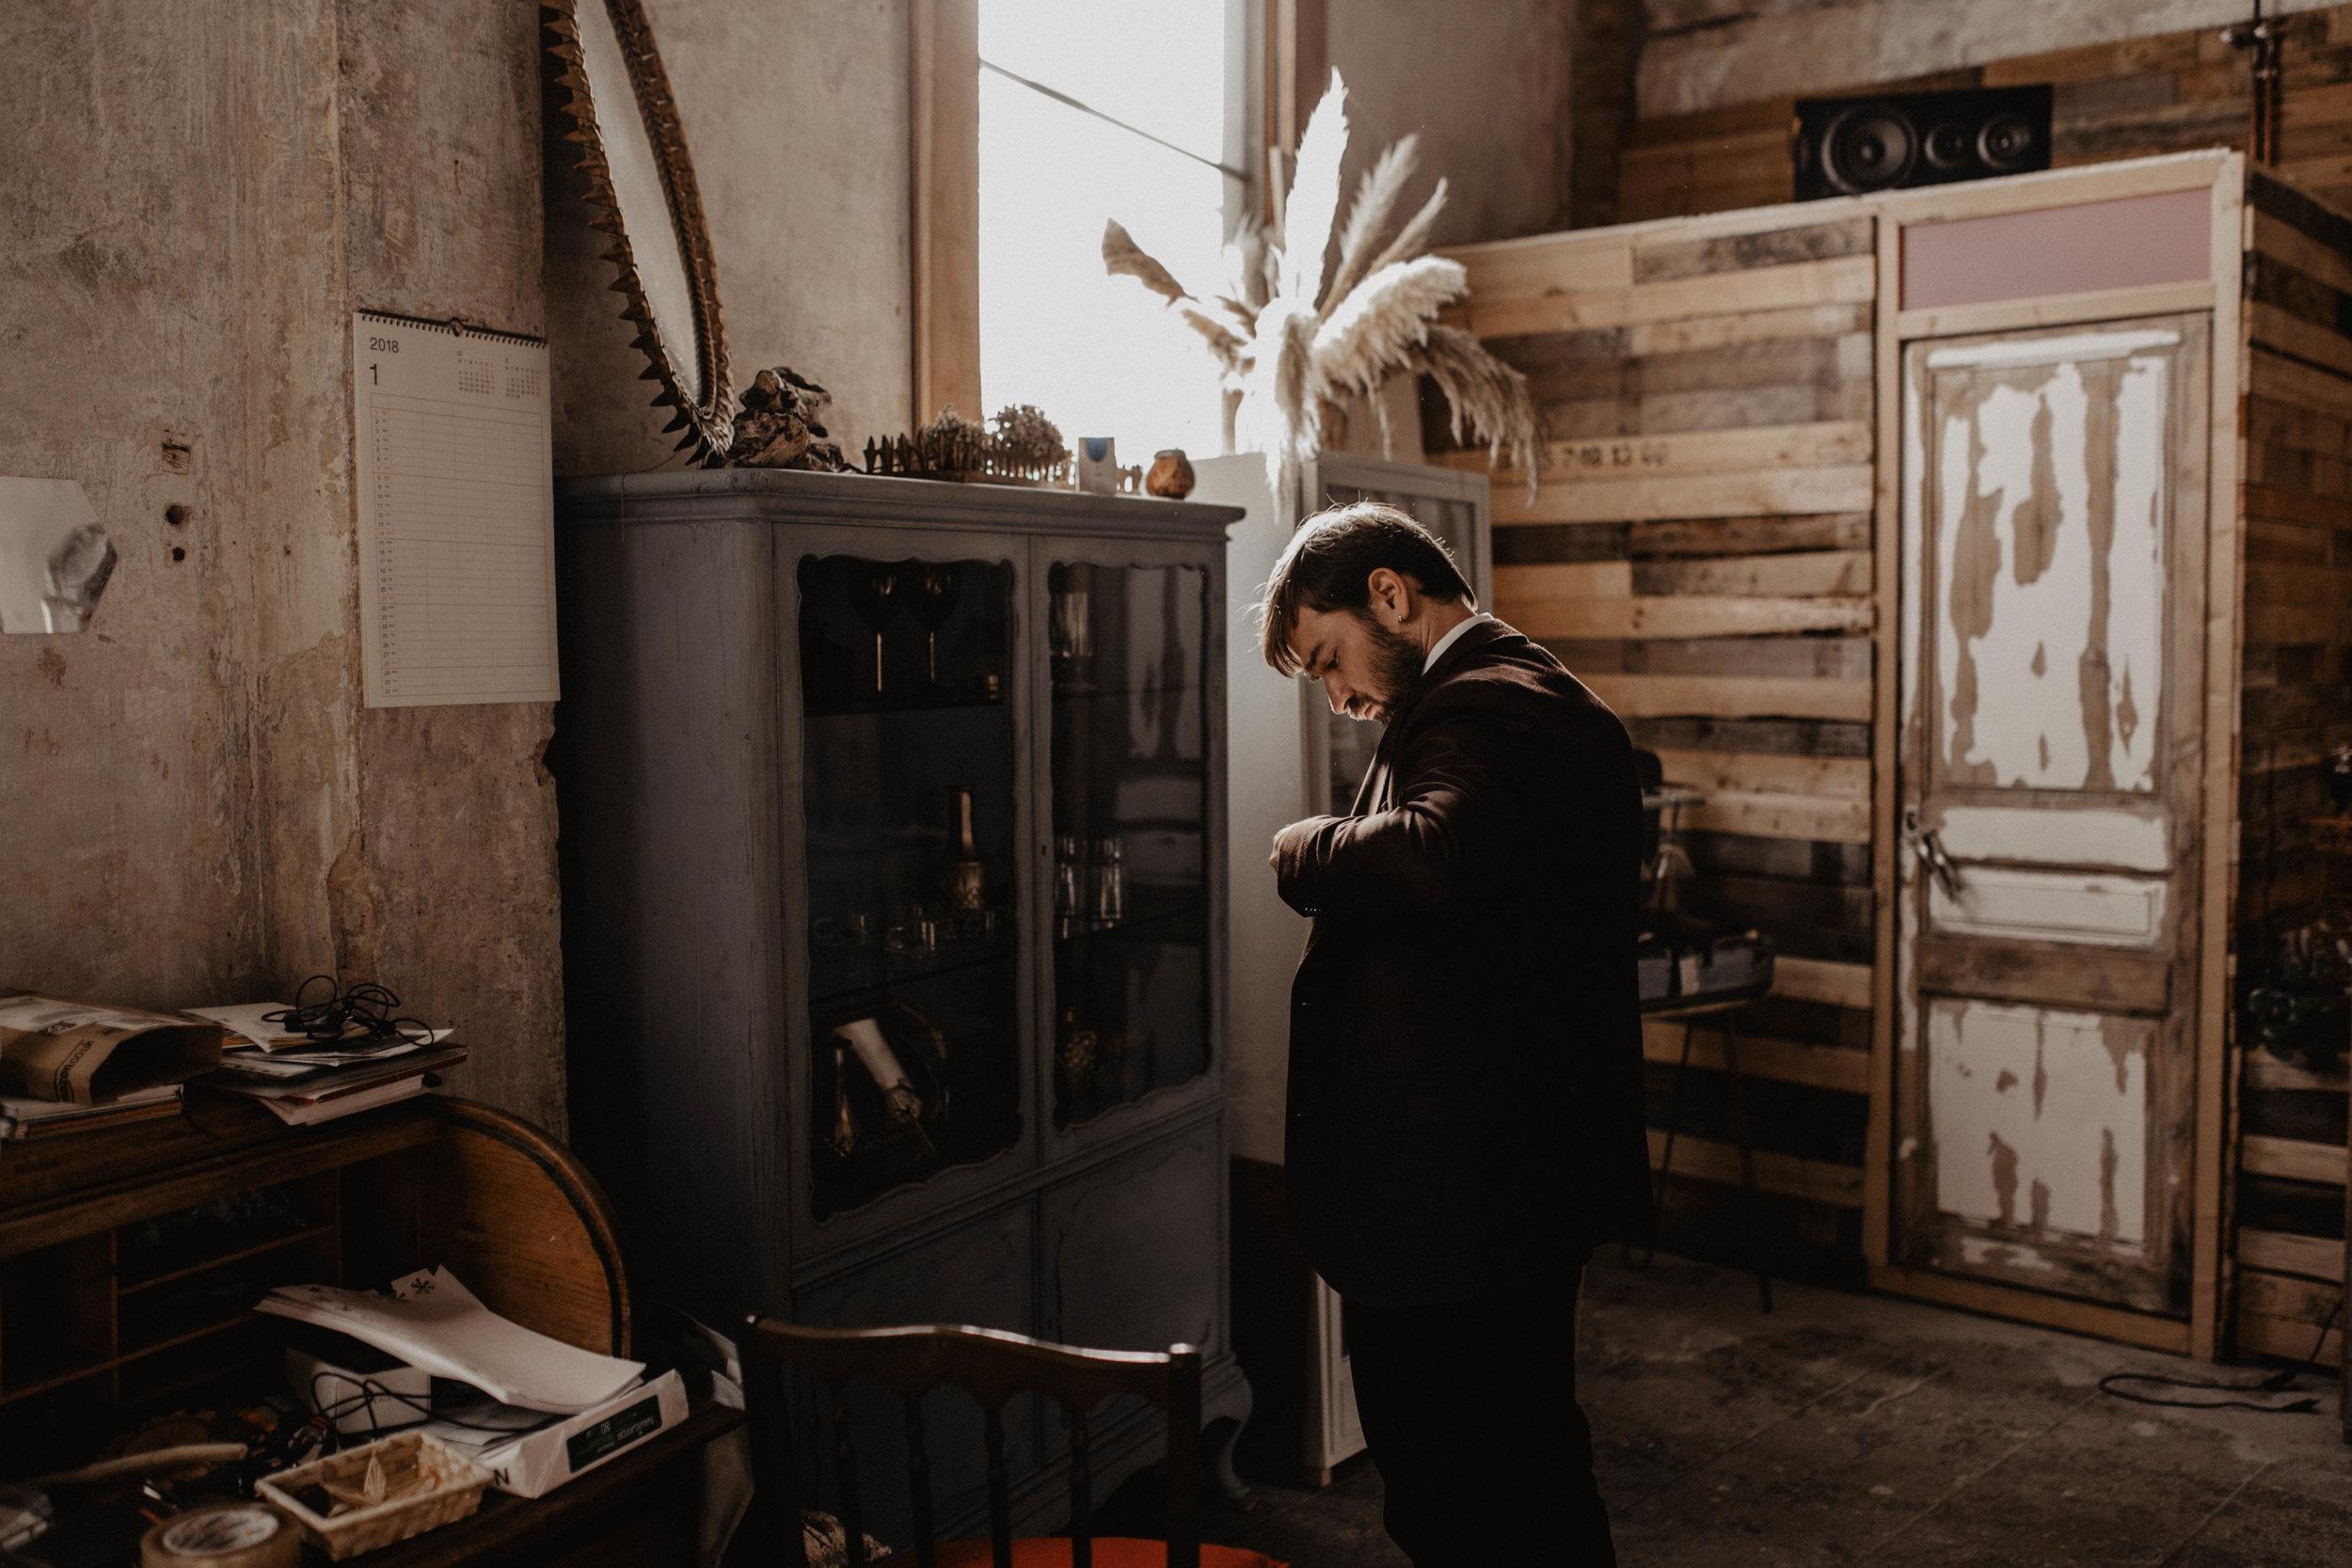 thenortherngirlphotography-photography-weddingphotography-couple-bodasconestilo-bodasenbarcelona-martadavid-53.jpg